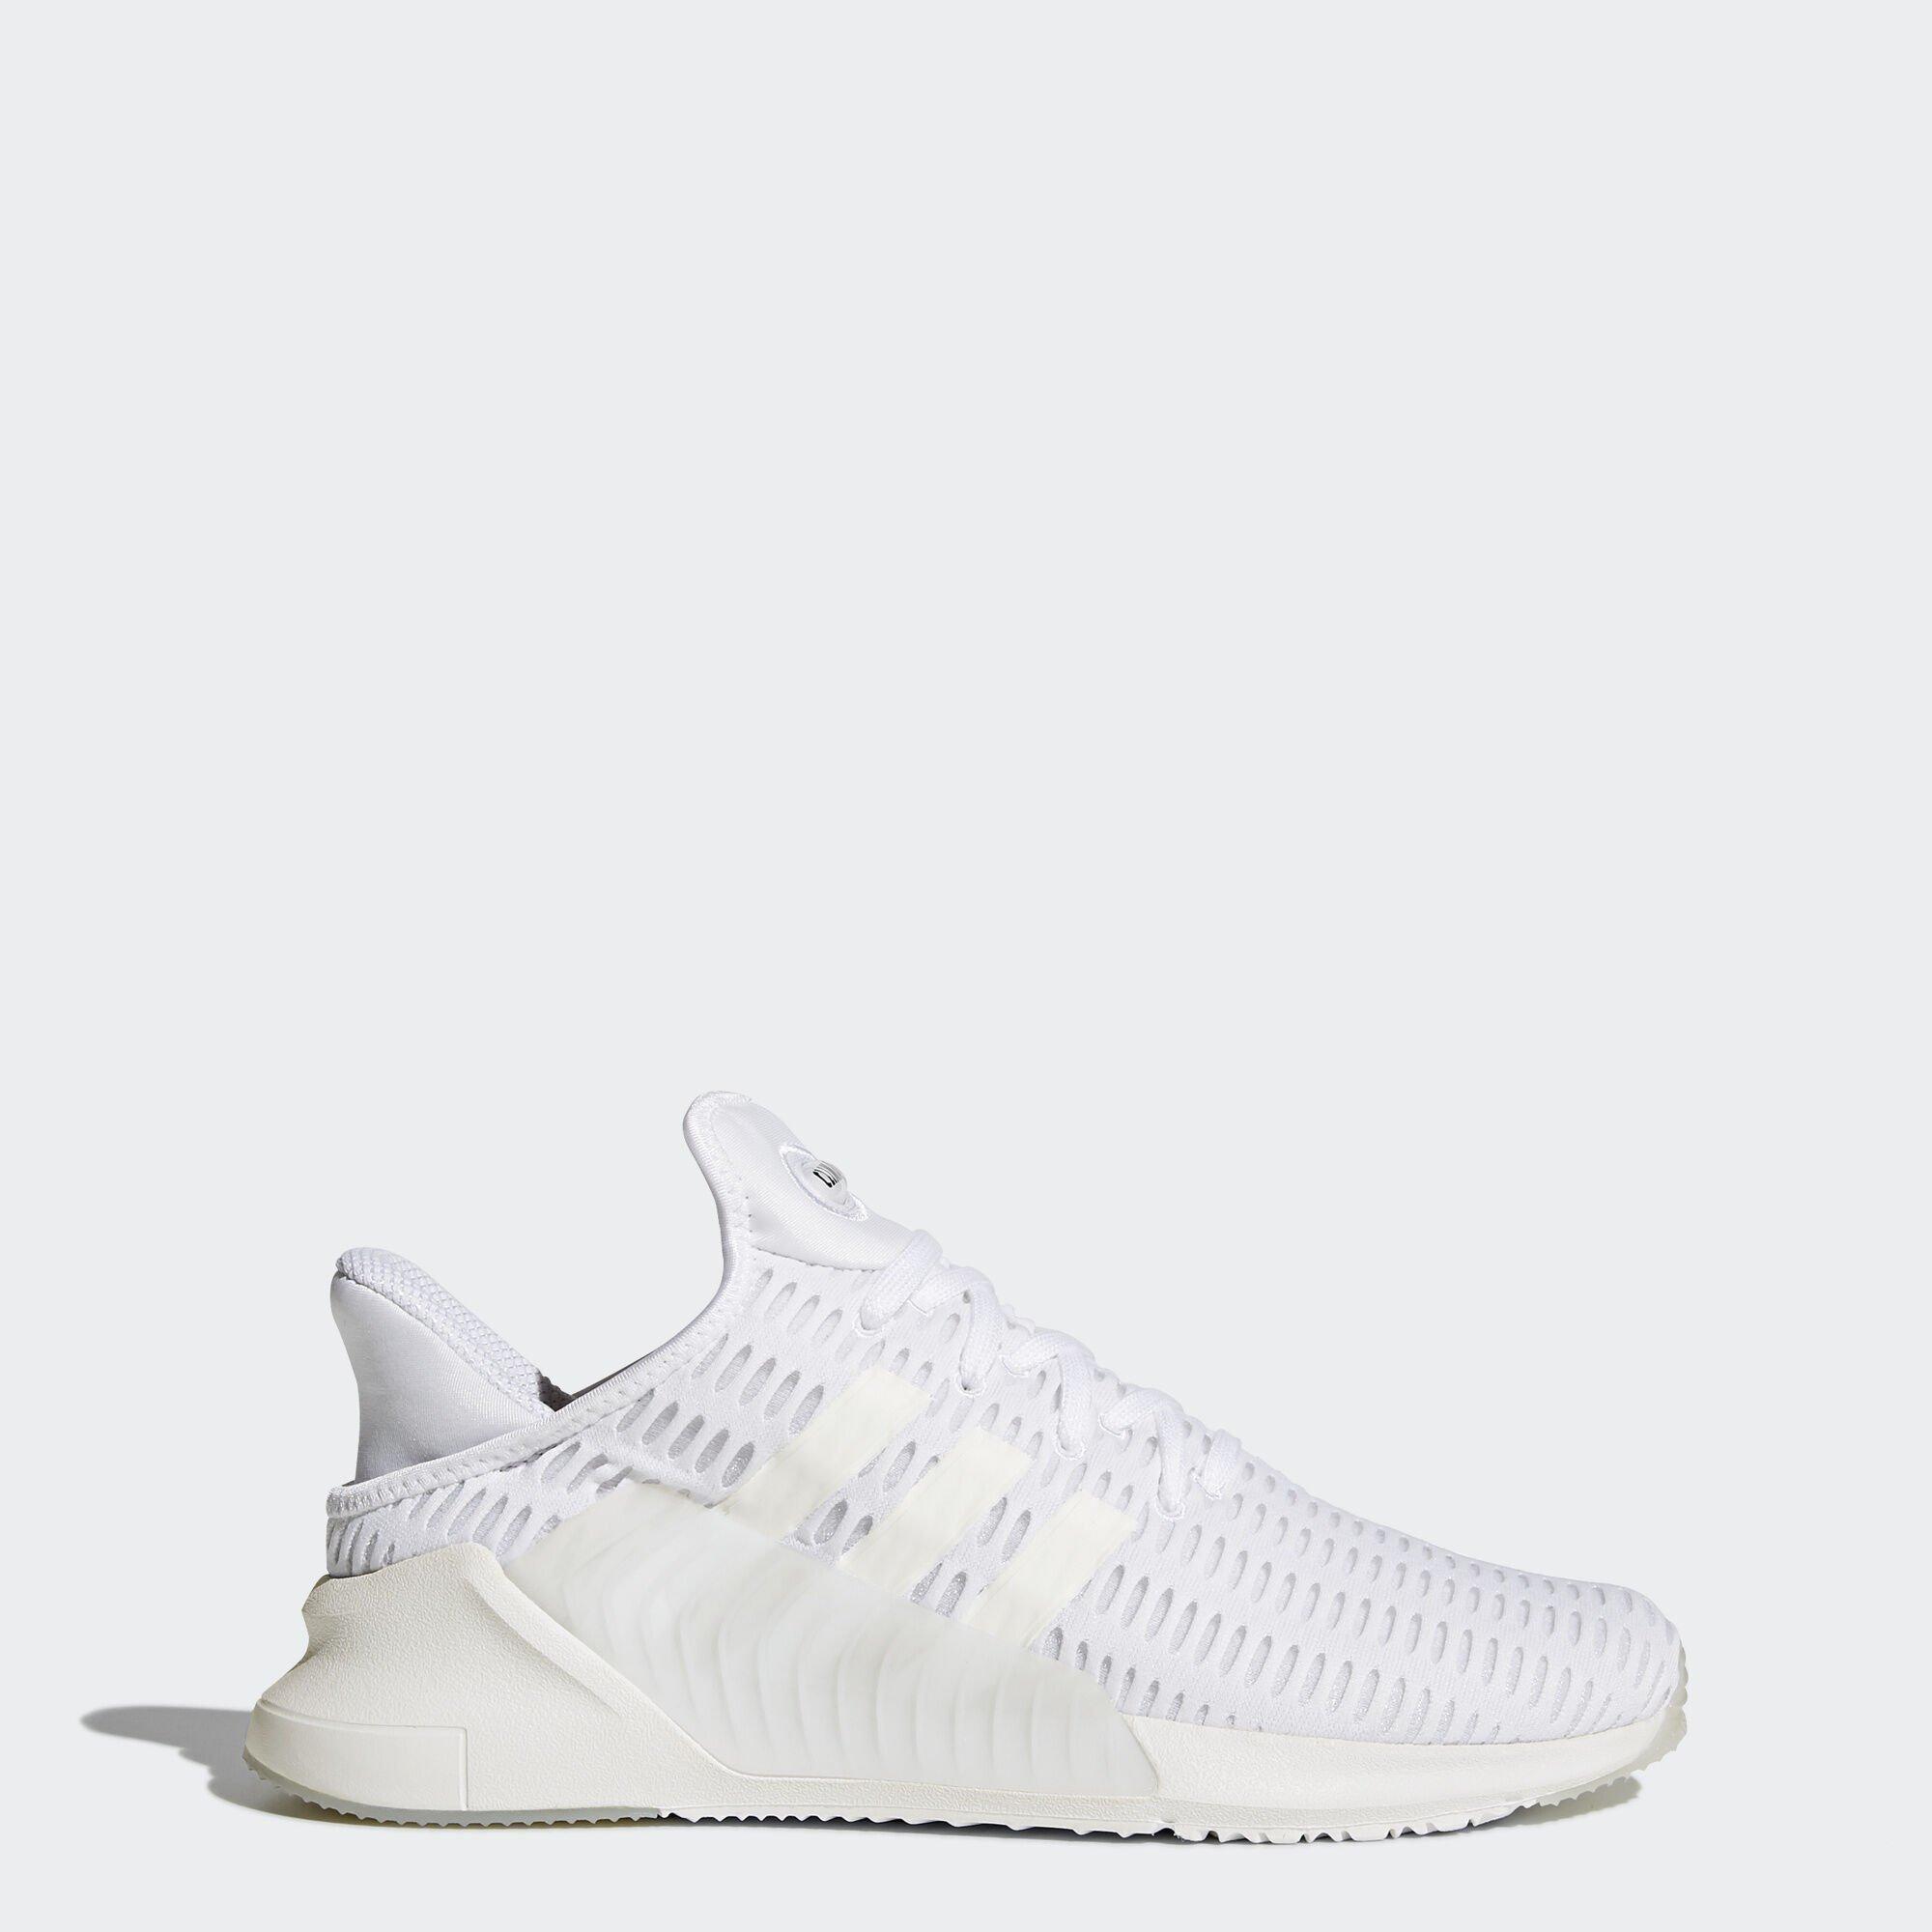 adidas Climacool 0217 Triple White